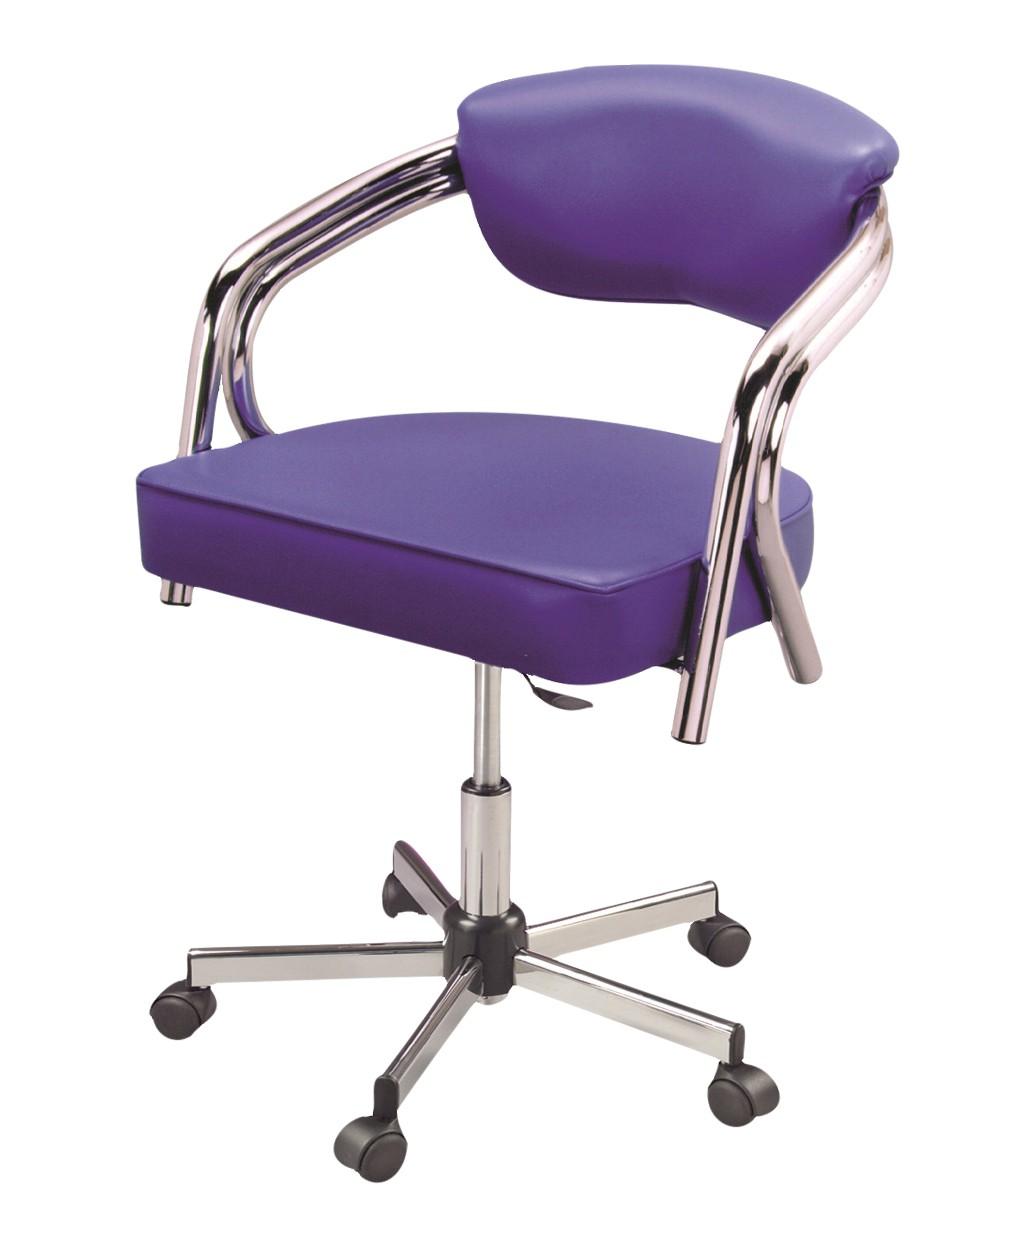 Pibbs 4692 Americana Desk Chair